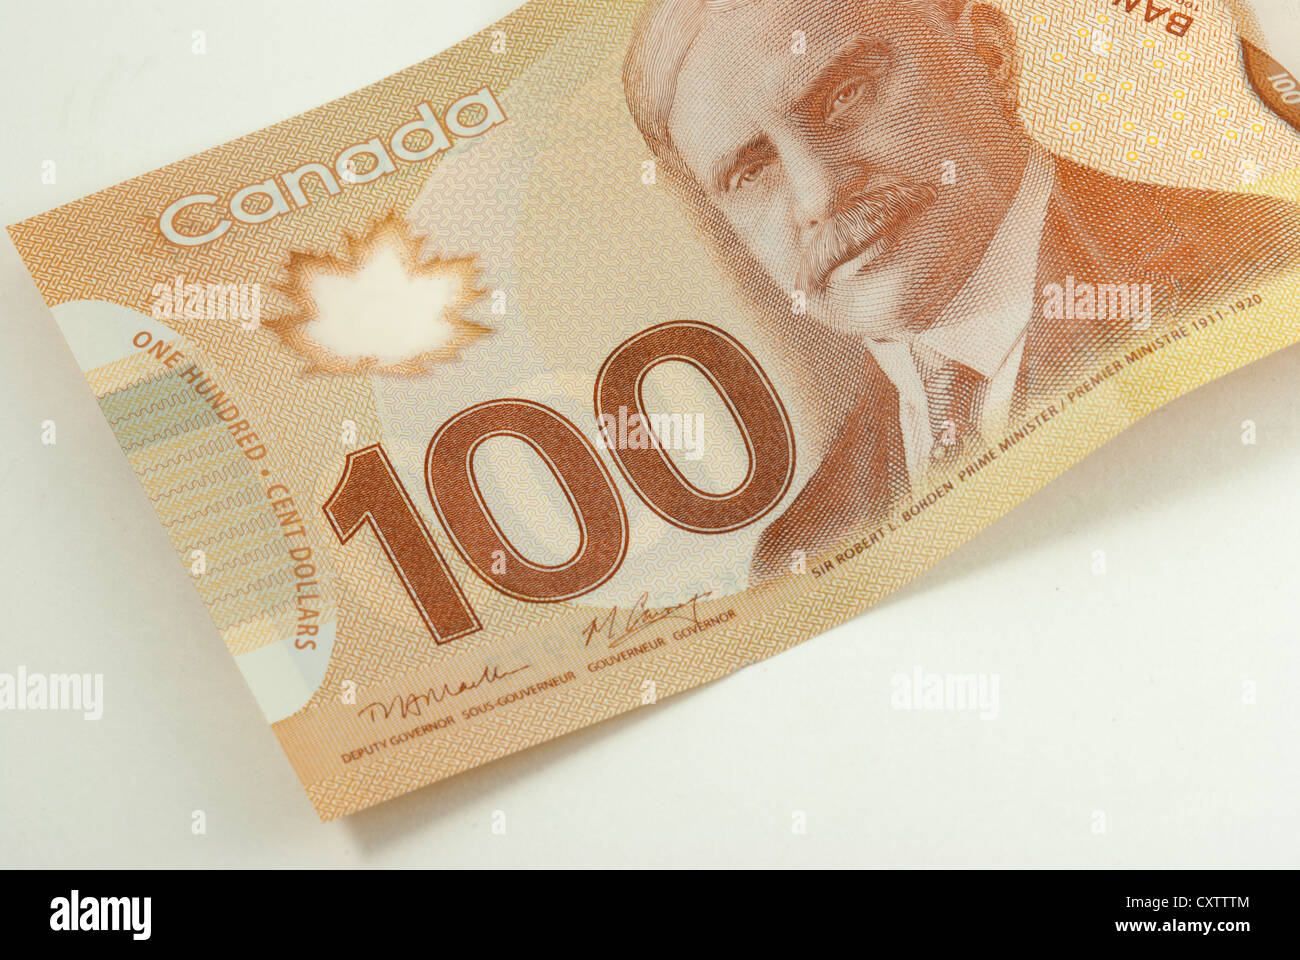 Hundred Canadian dollar bank note isolated  on white background - Stock Image